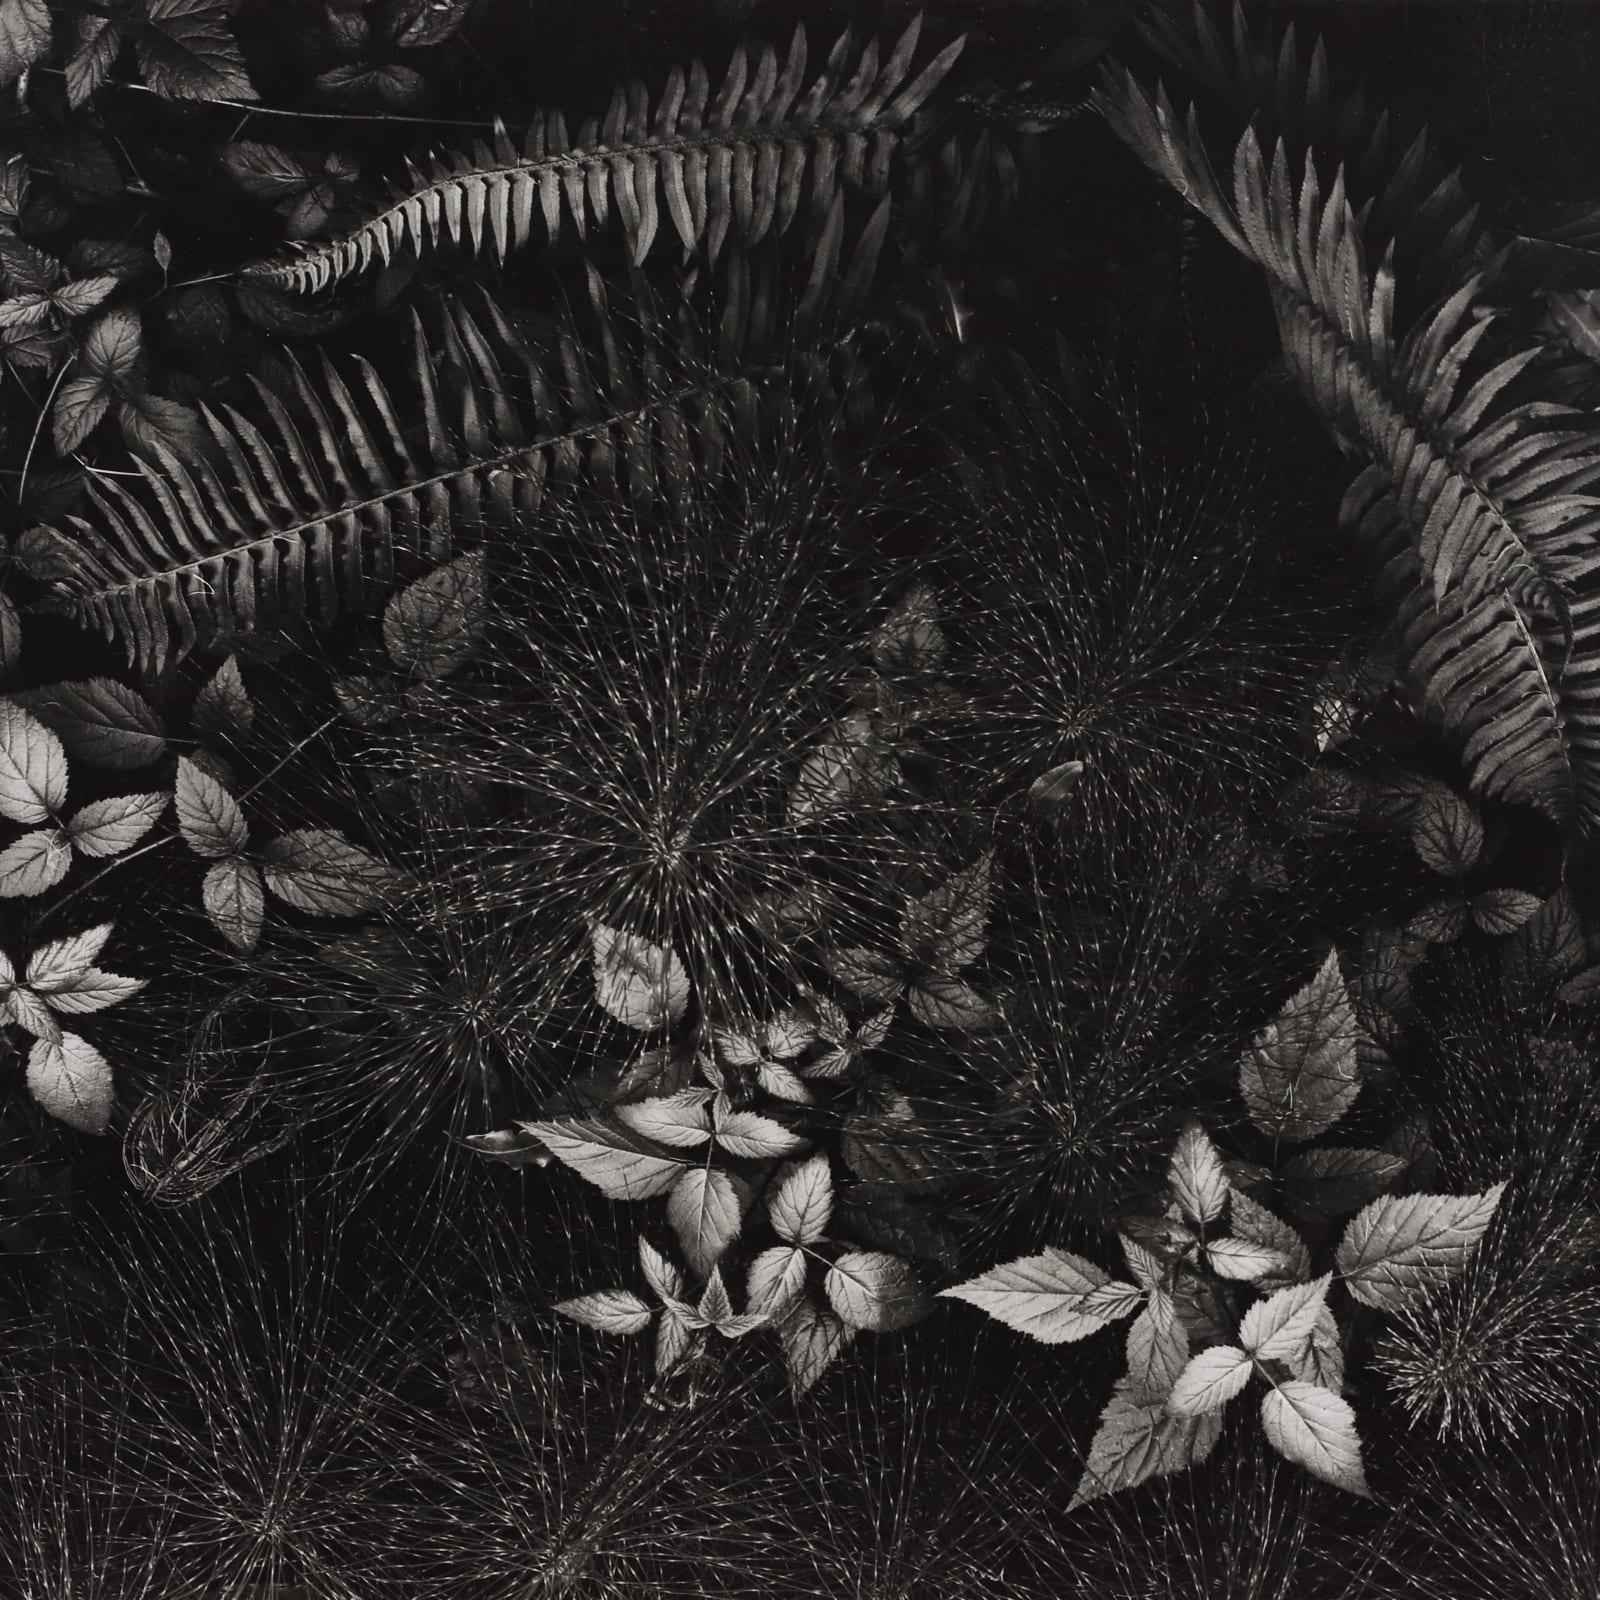 Ansel Adams  Leaves, Mills College, 1931  Silver Gelatin  10 1/2 x 12 3/4 in